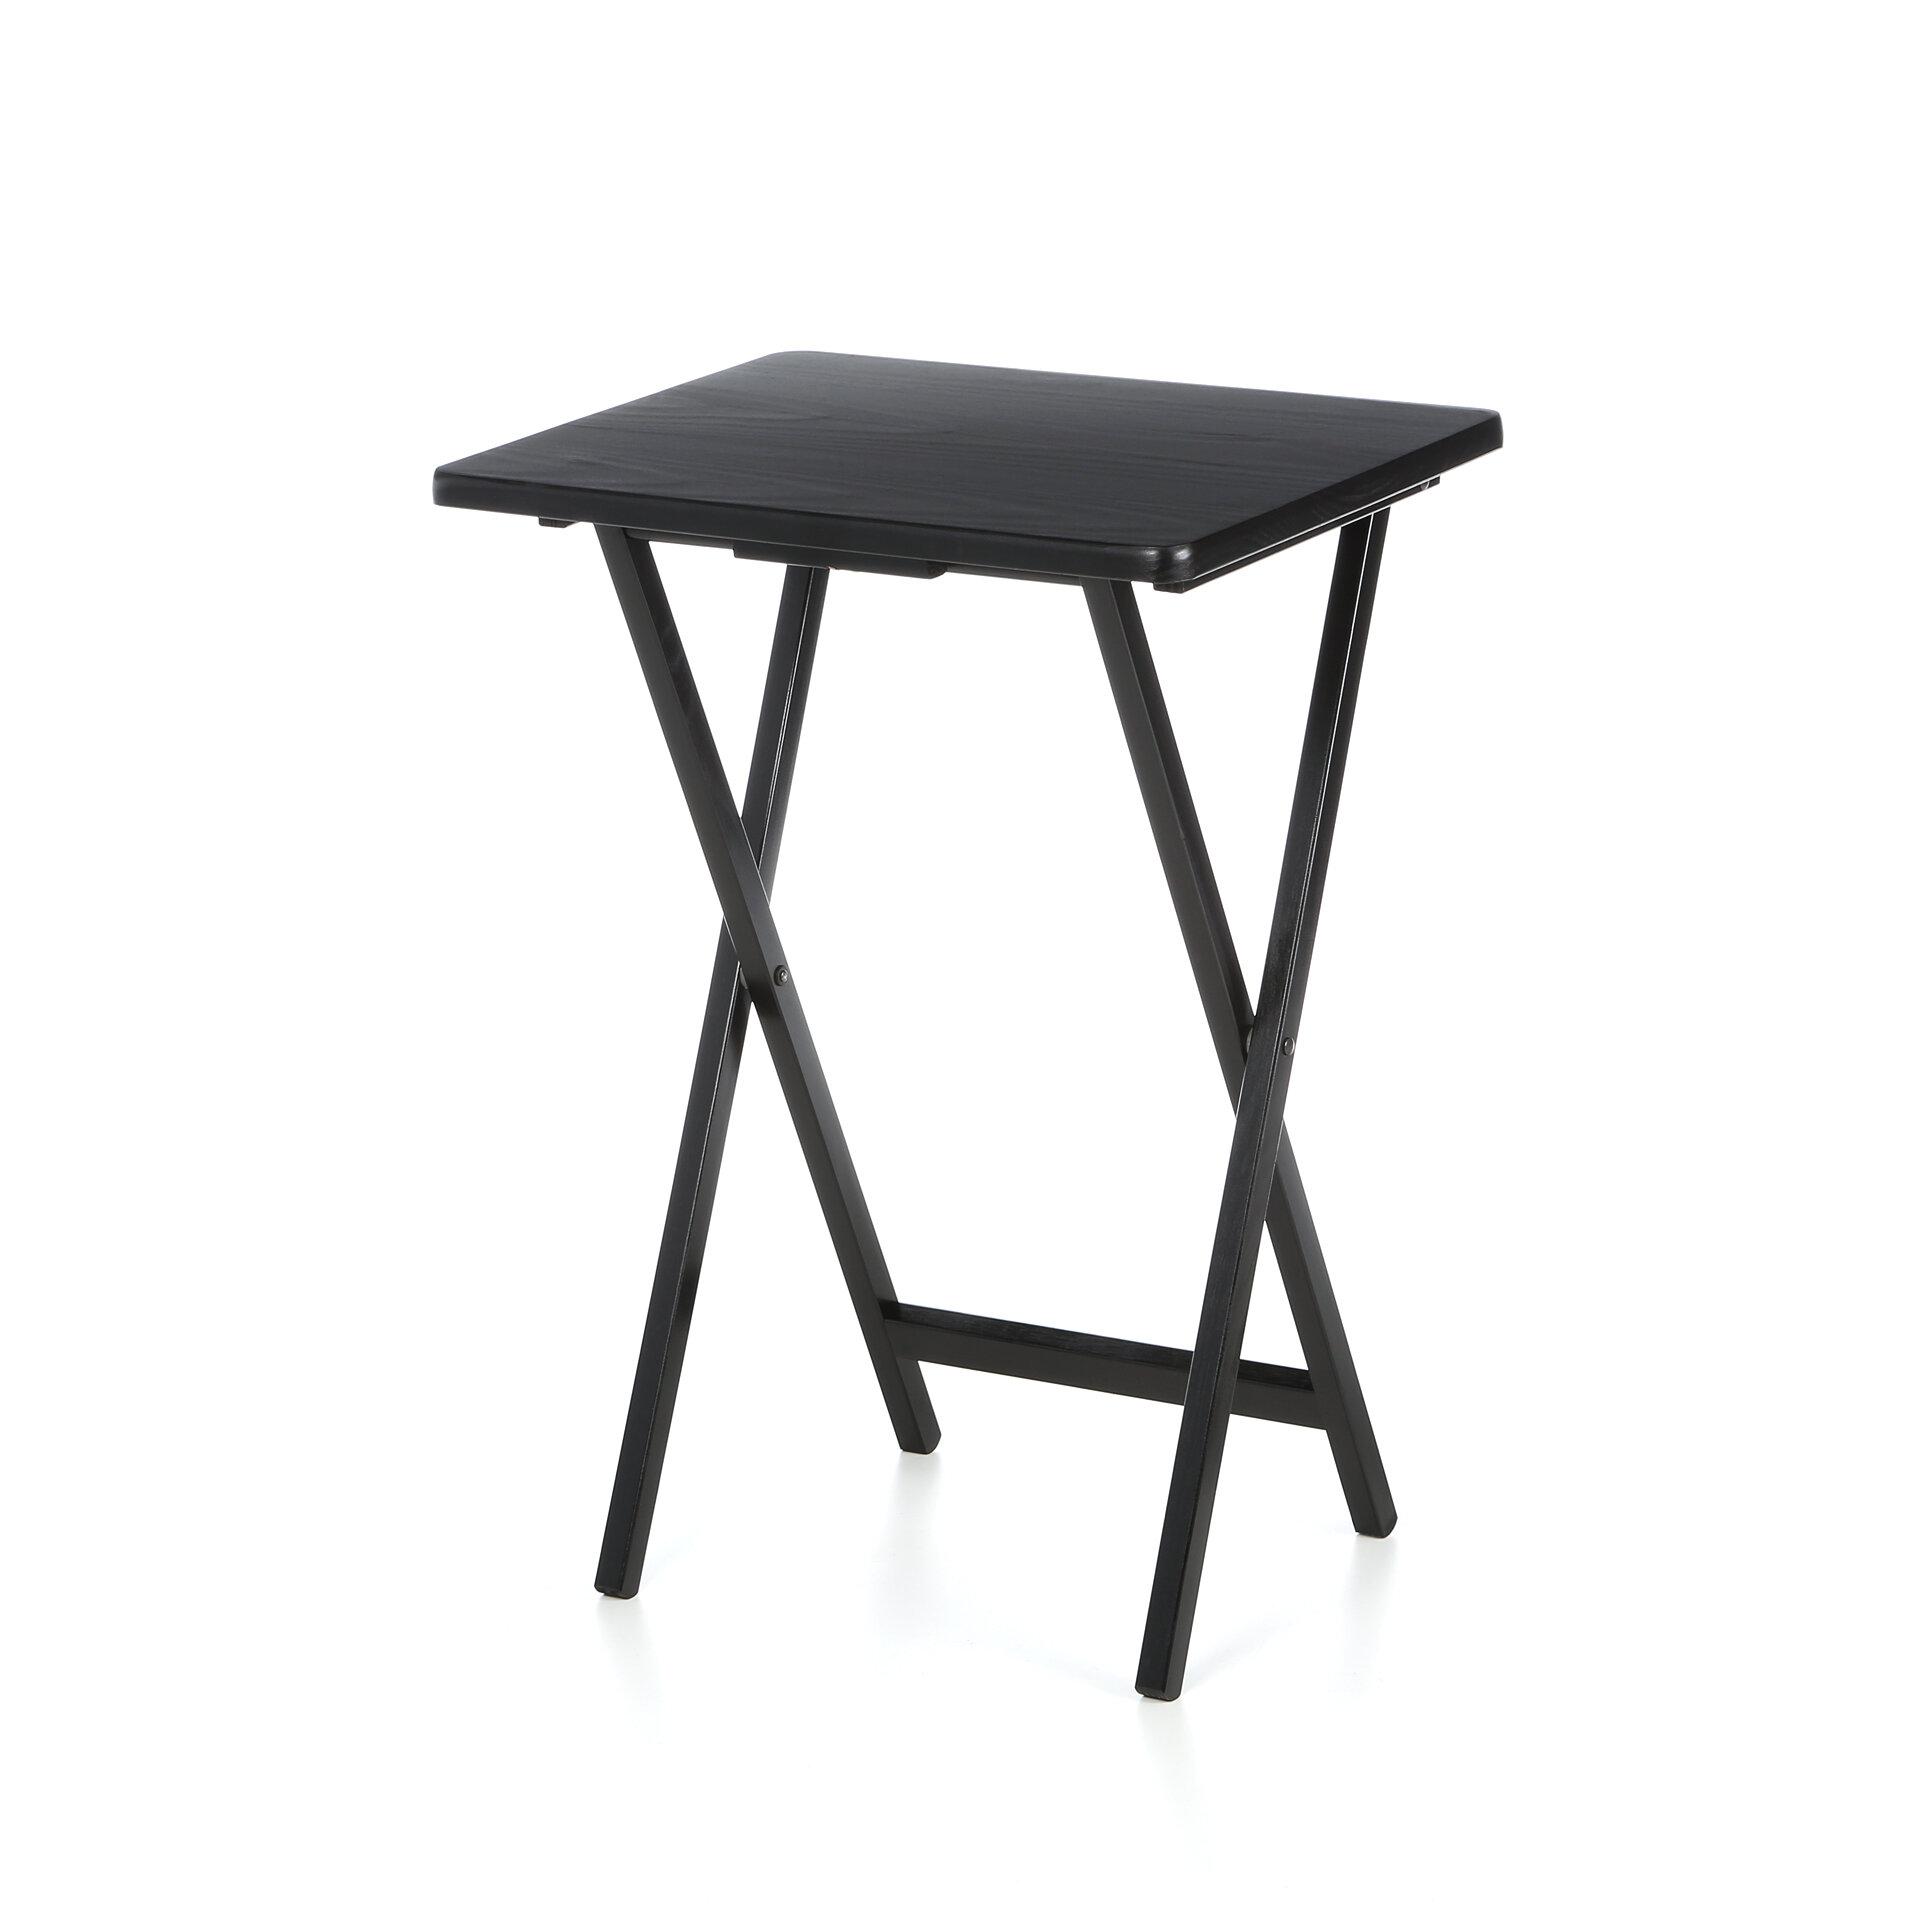 Red Barrel Studio Baca Ledbury Folding Tv Tray Table Set With Stand Reviews Wayfair